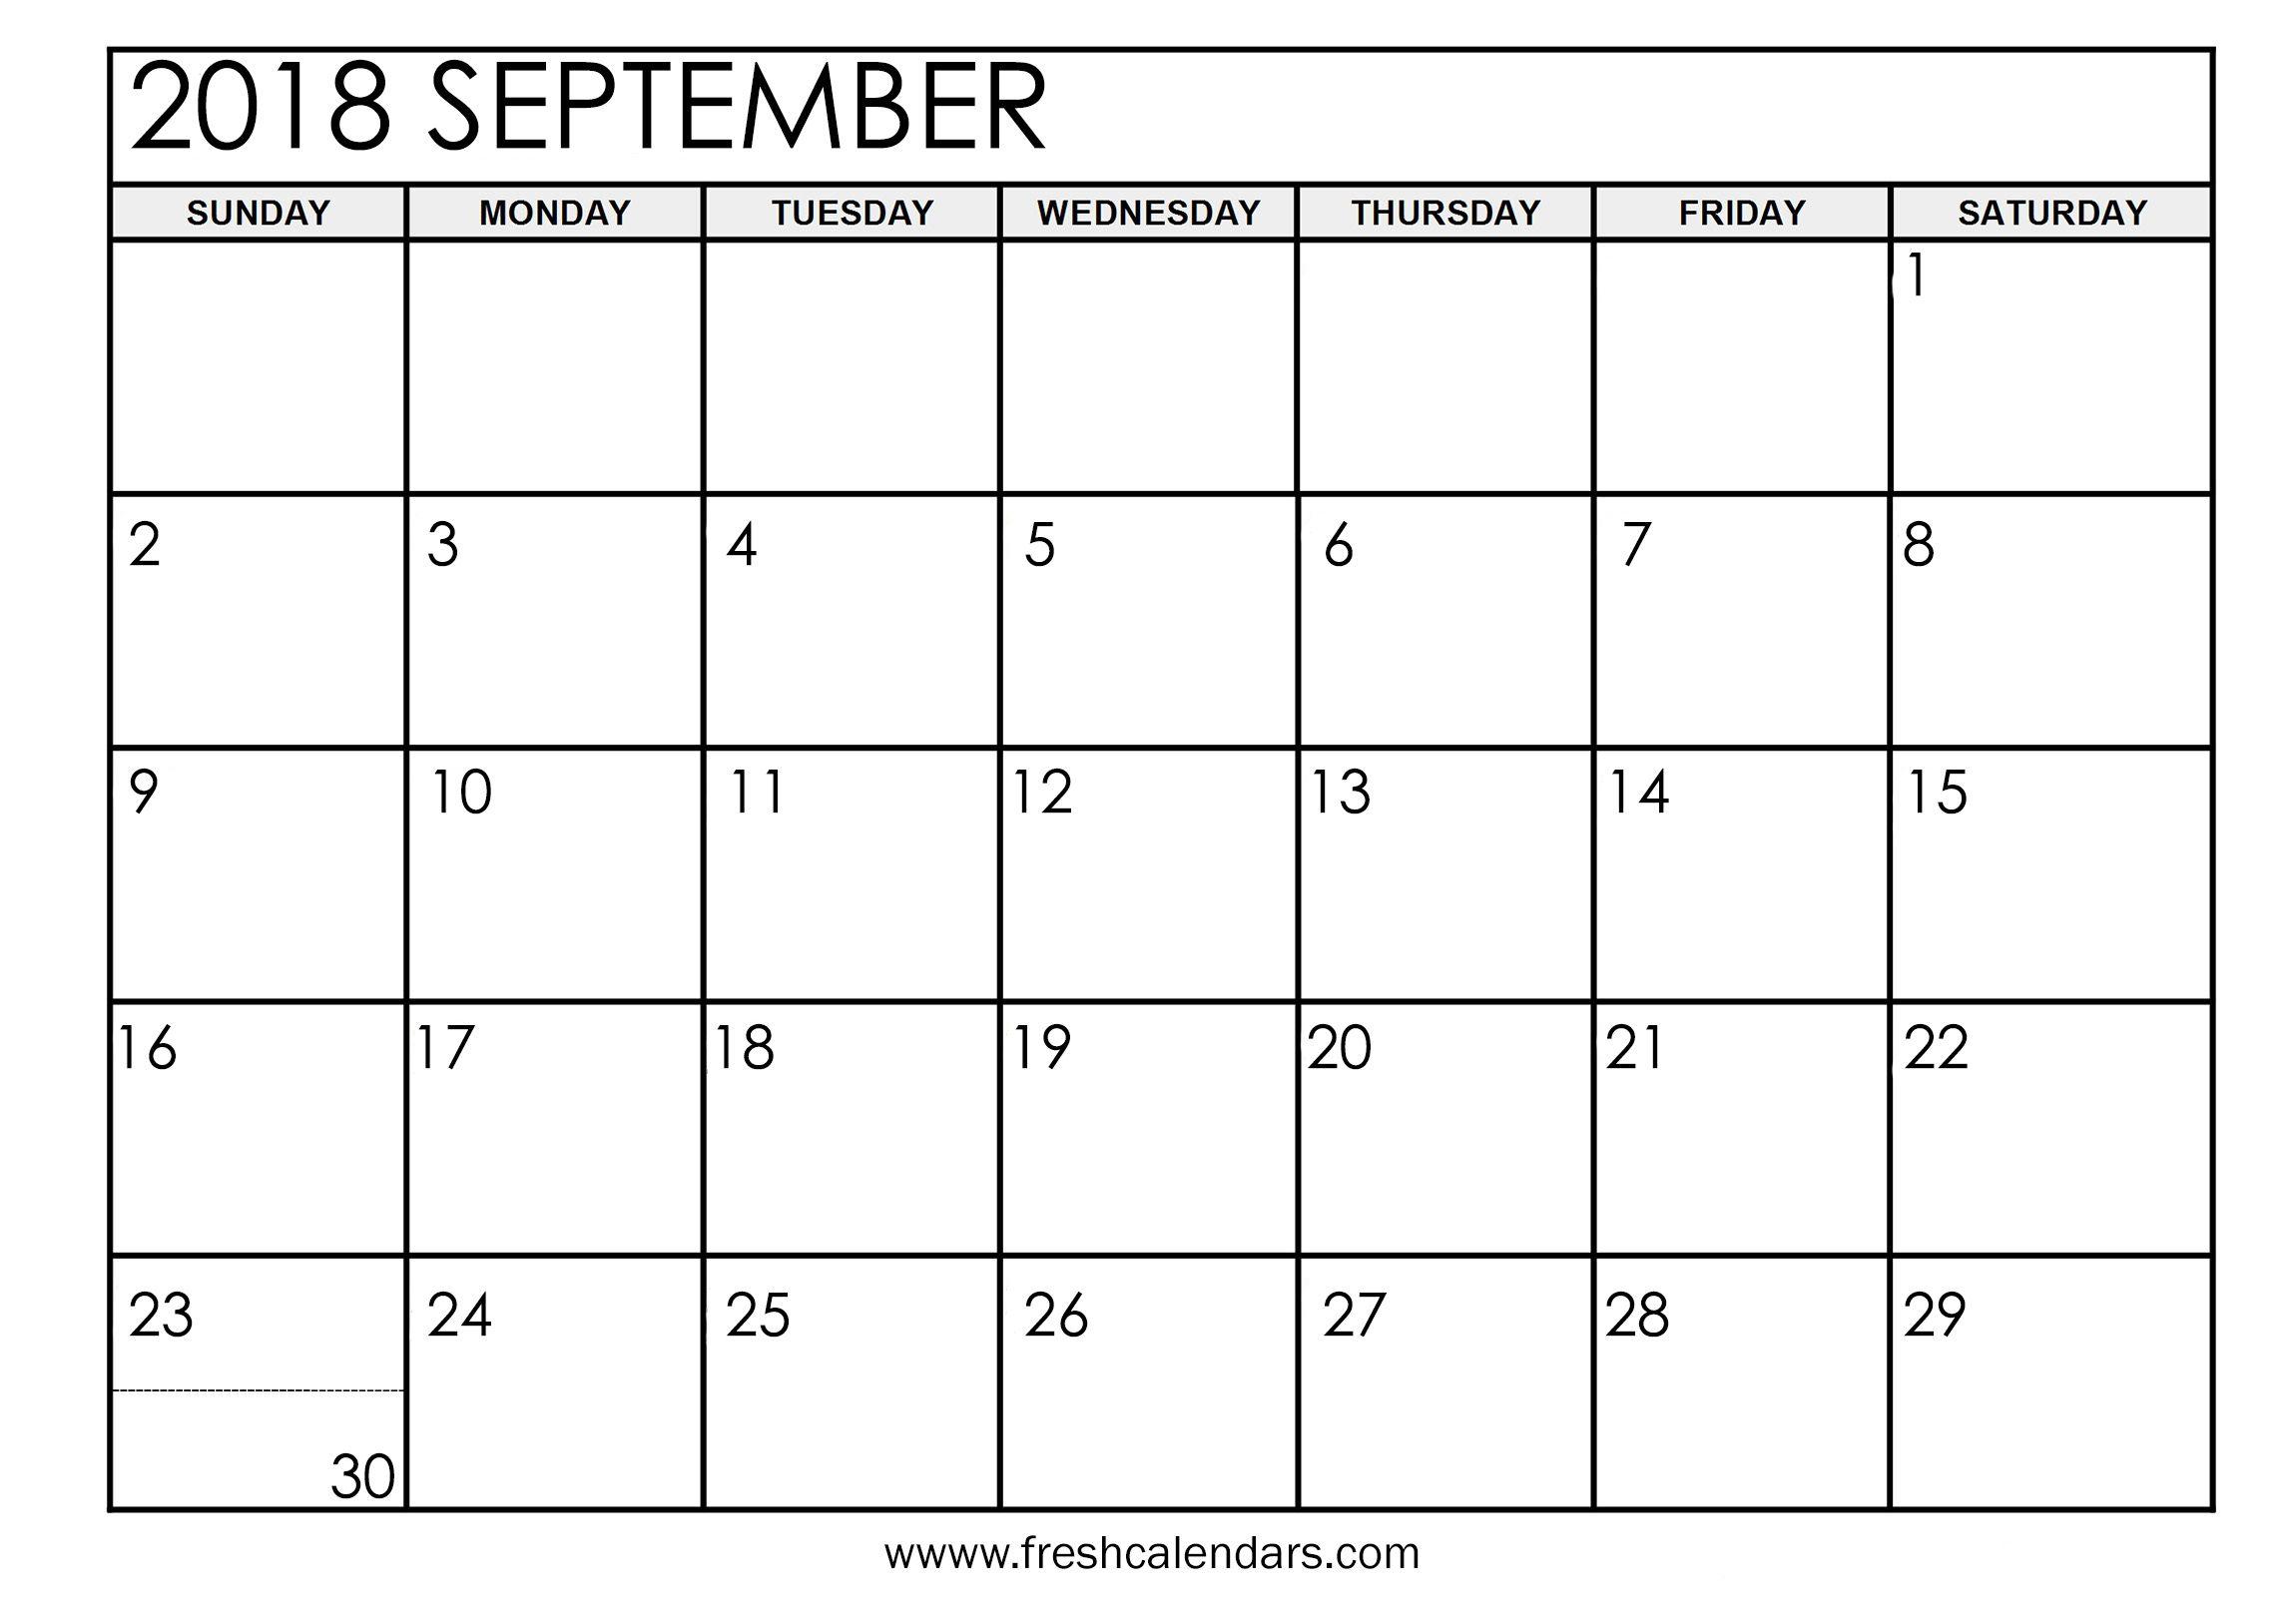 Printable September 2018 Calendar | Hauck Mansion for Blank Printable September Calendar